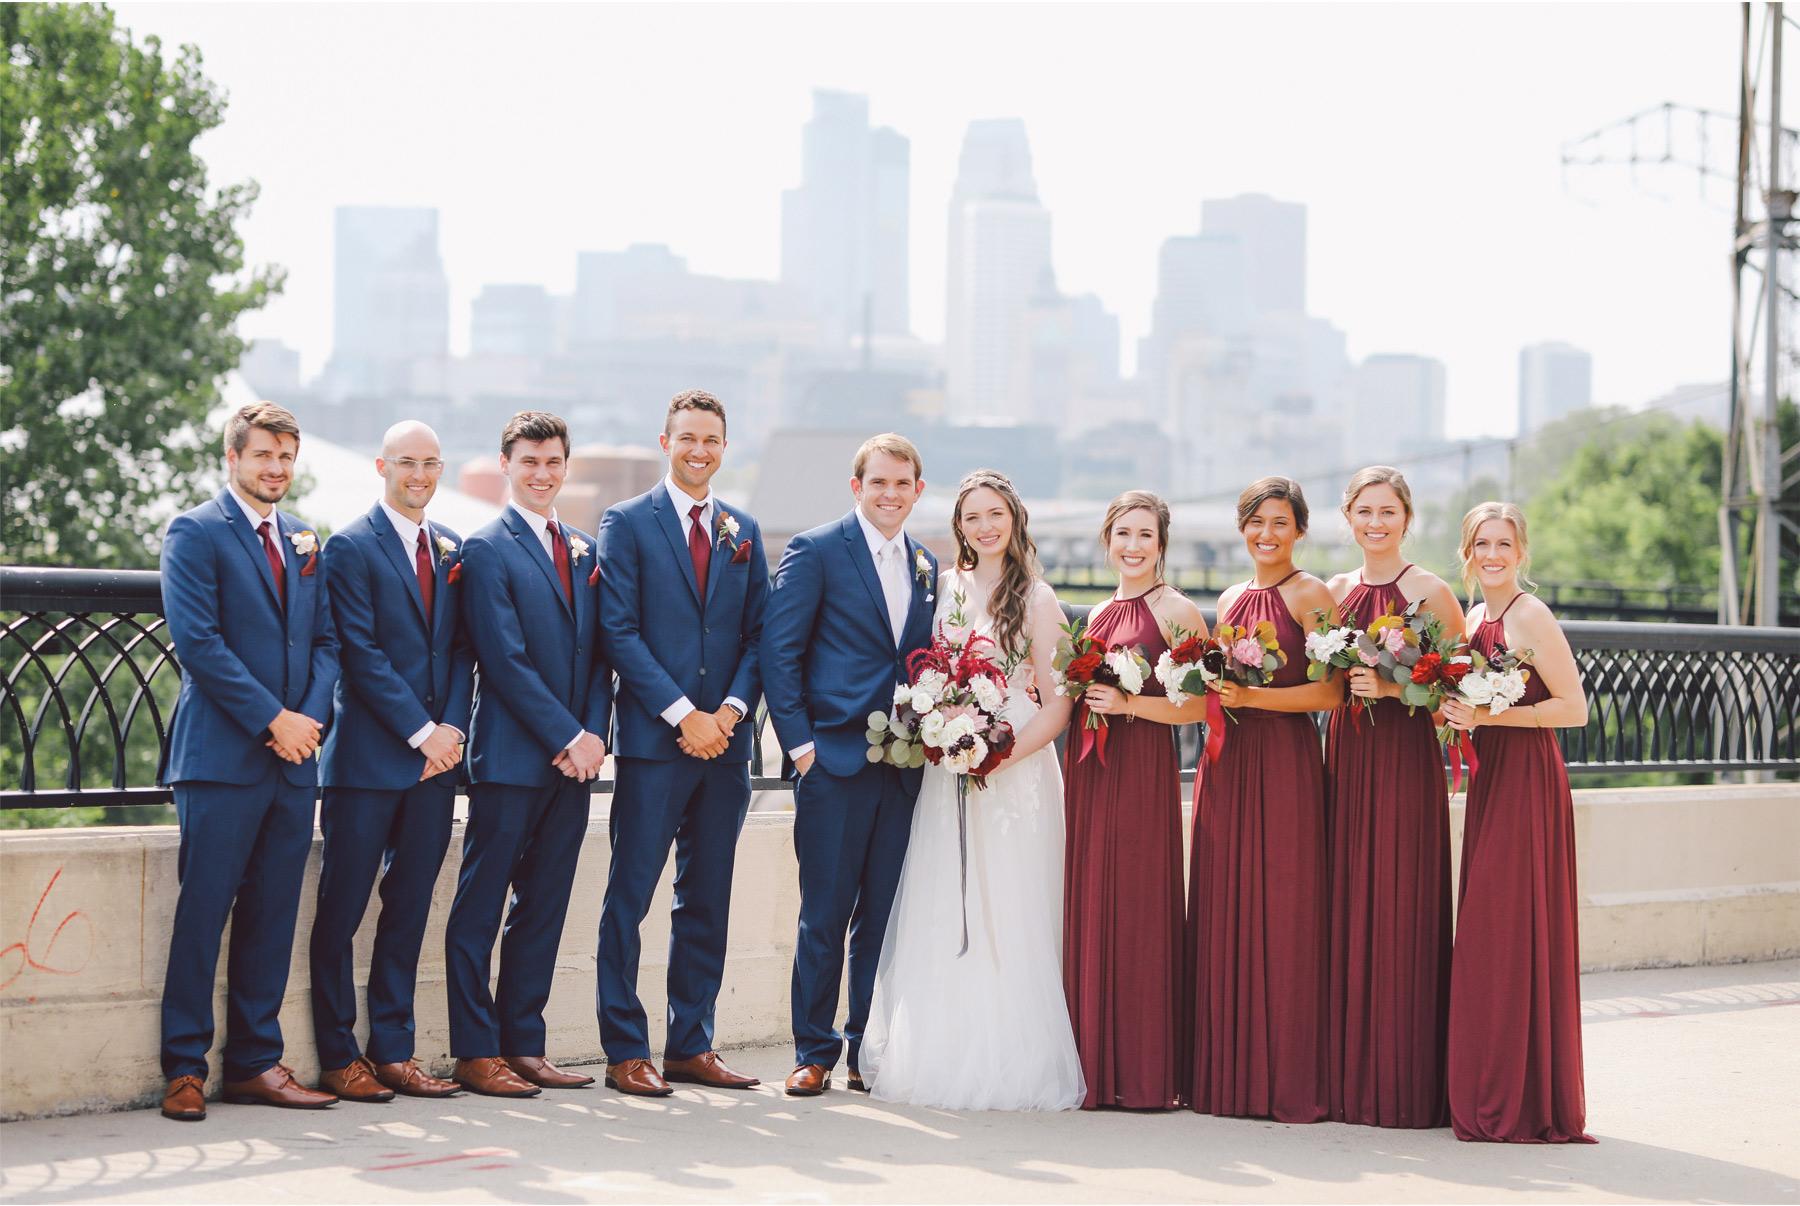 13-Saint-Paul-Minnesota-Wedding-Photography-by-Vick-Photography-City-Skyline-Group-Wedding-Party-Kelsey-and-Jeffery.jpg